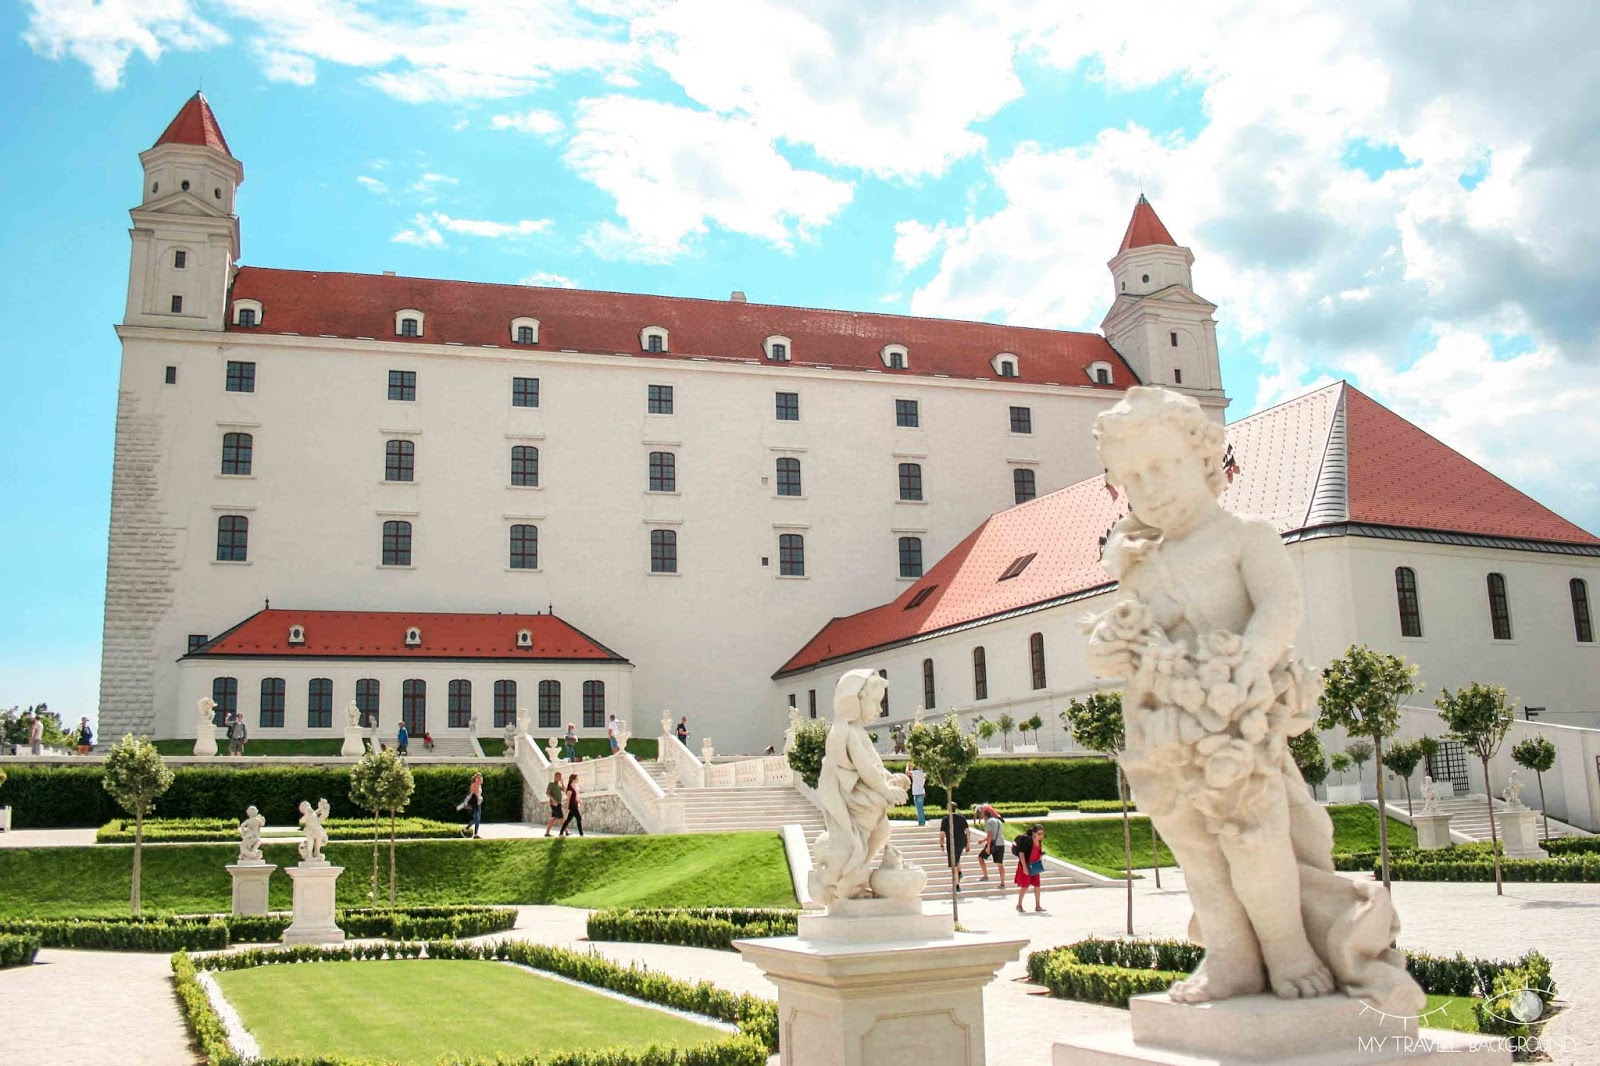 My Travel Background : visiter Bratislava, la capitale de la Slovaquie, en 1 jour - Château de Bratislava